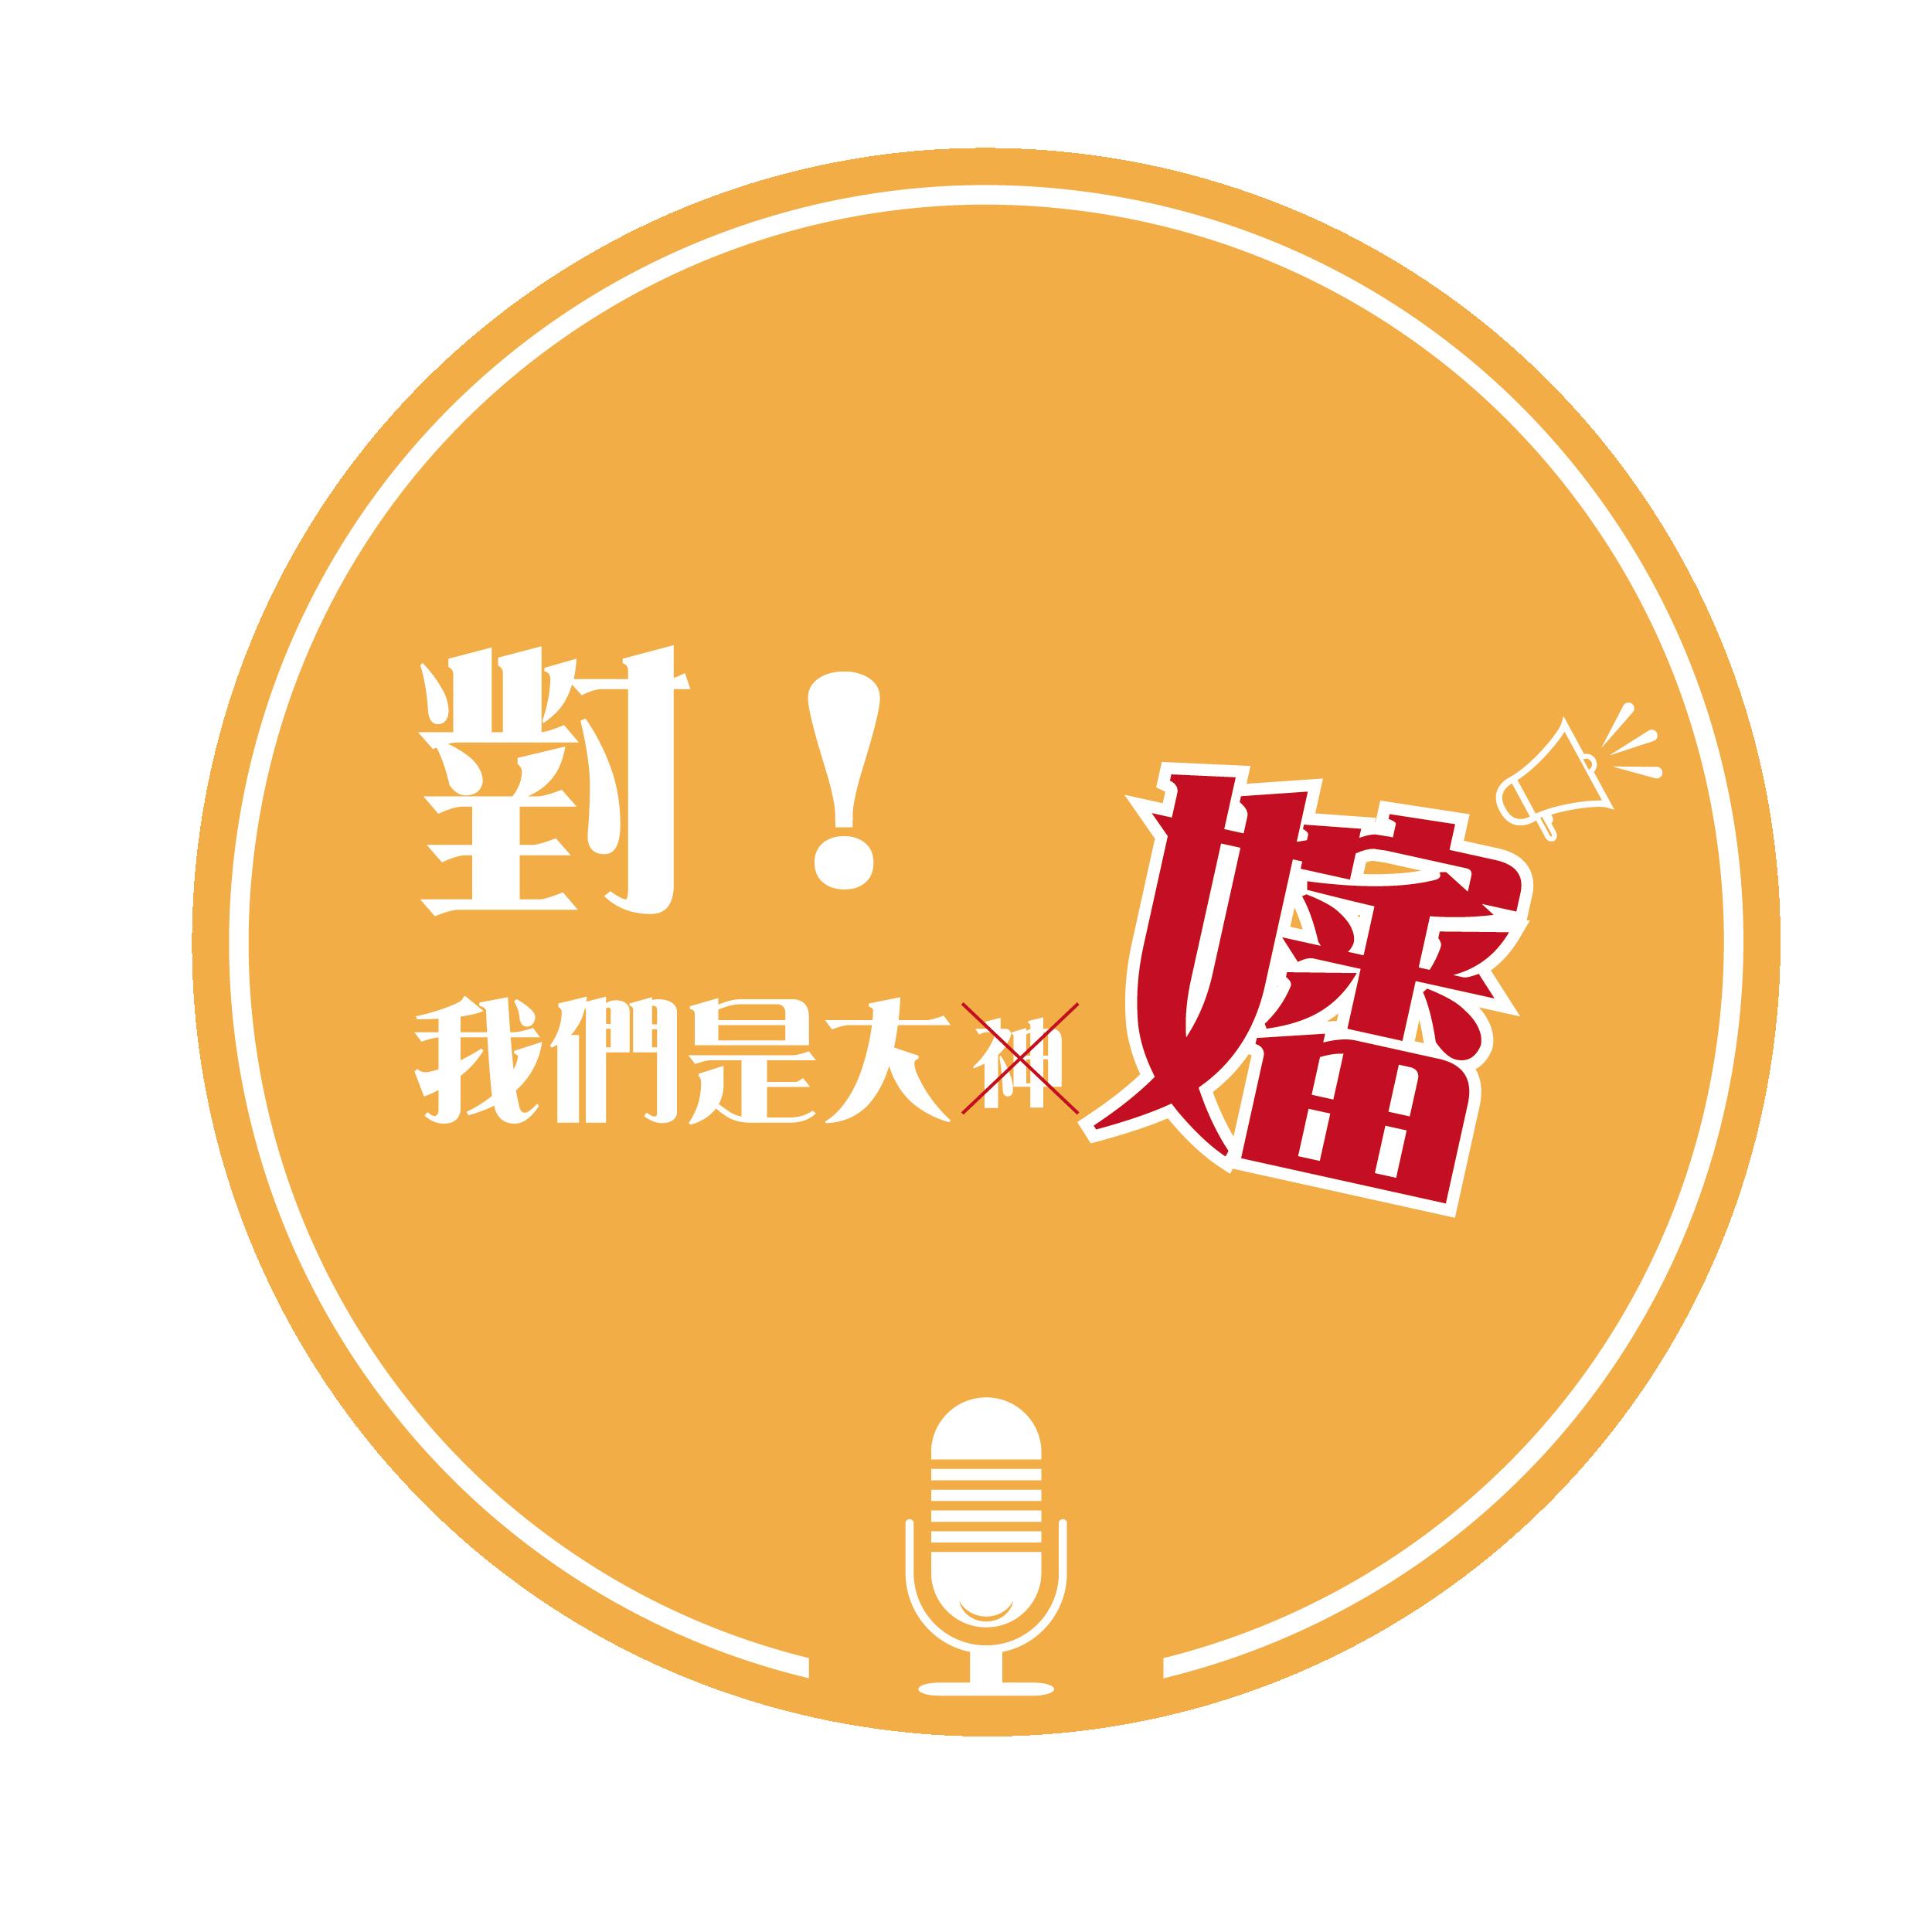 S2EP10 | 跨界廣播劇製作選角!? part.1  feat. 唐宏安